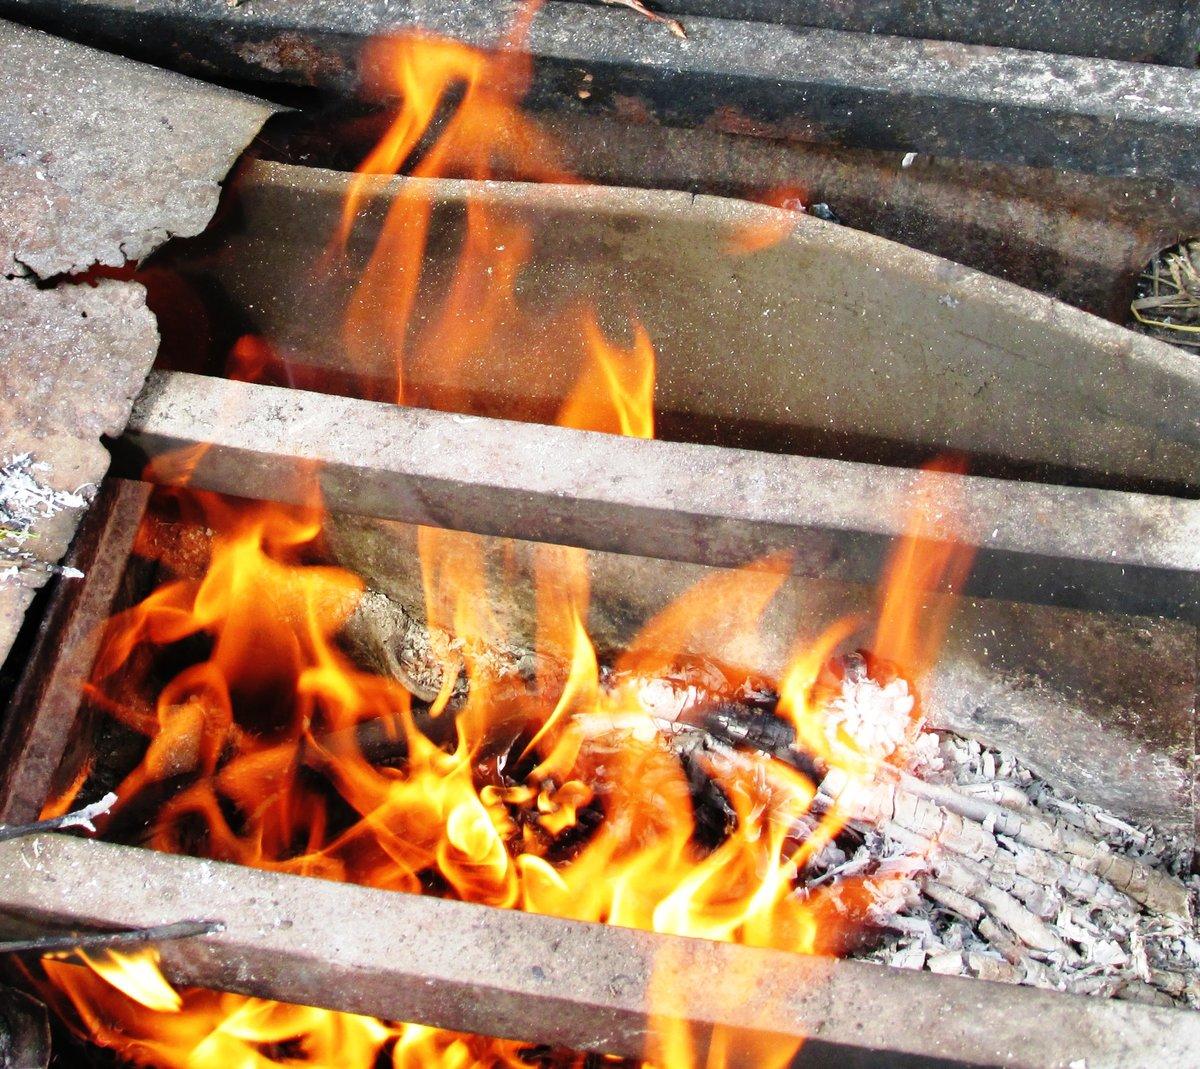 Фото металла в огне